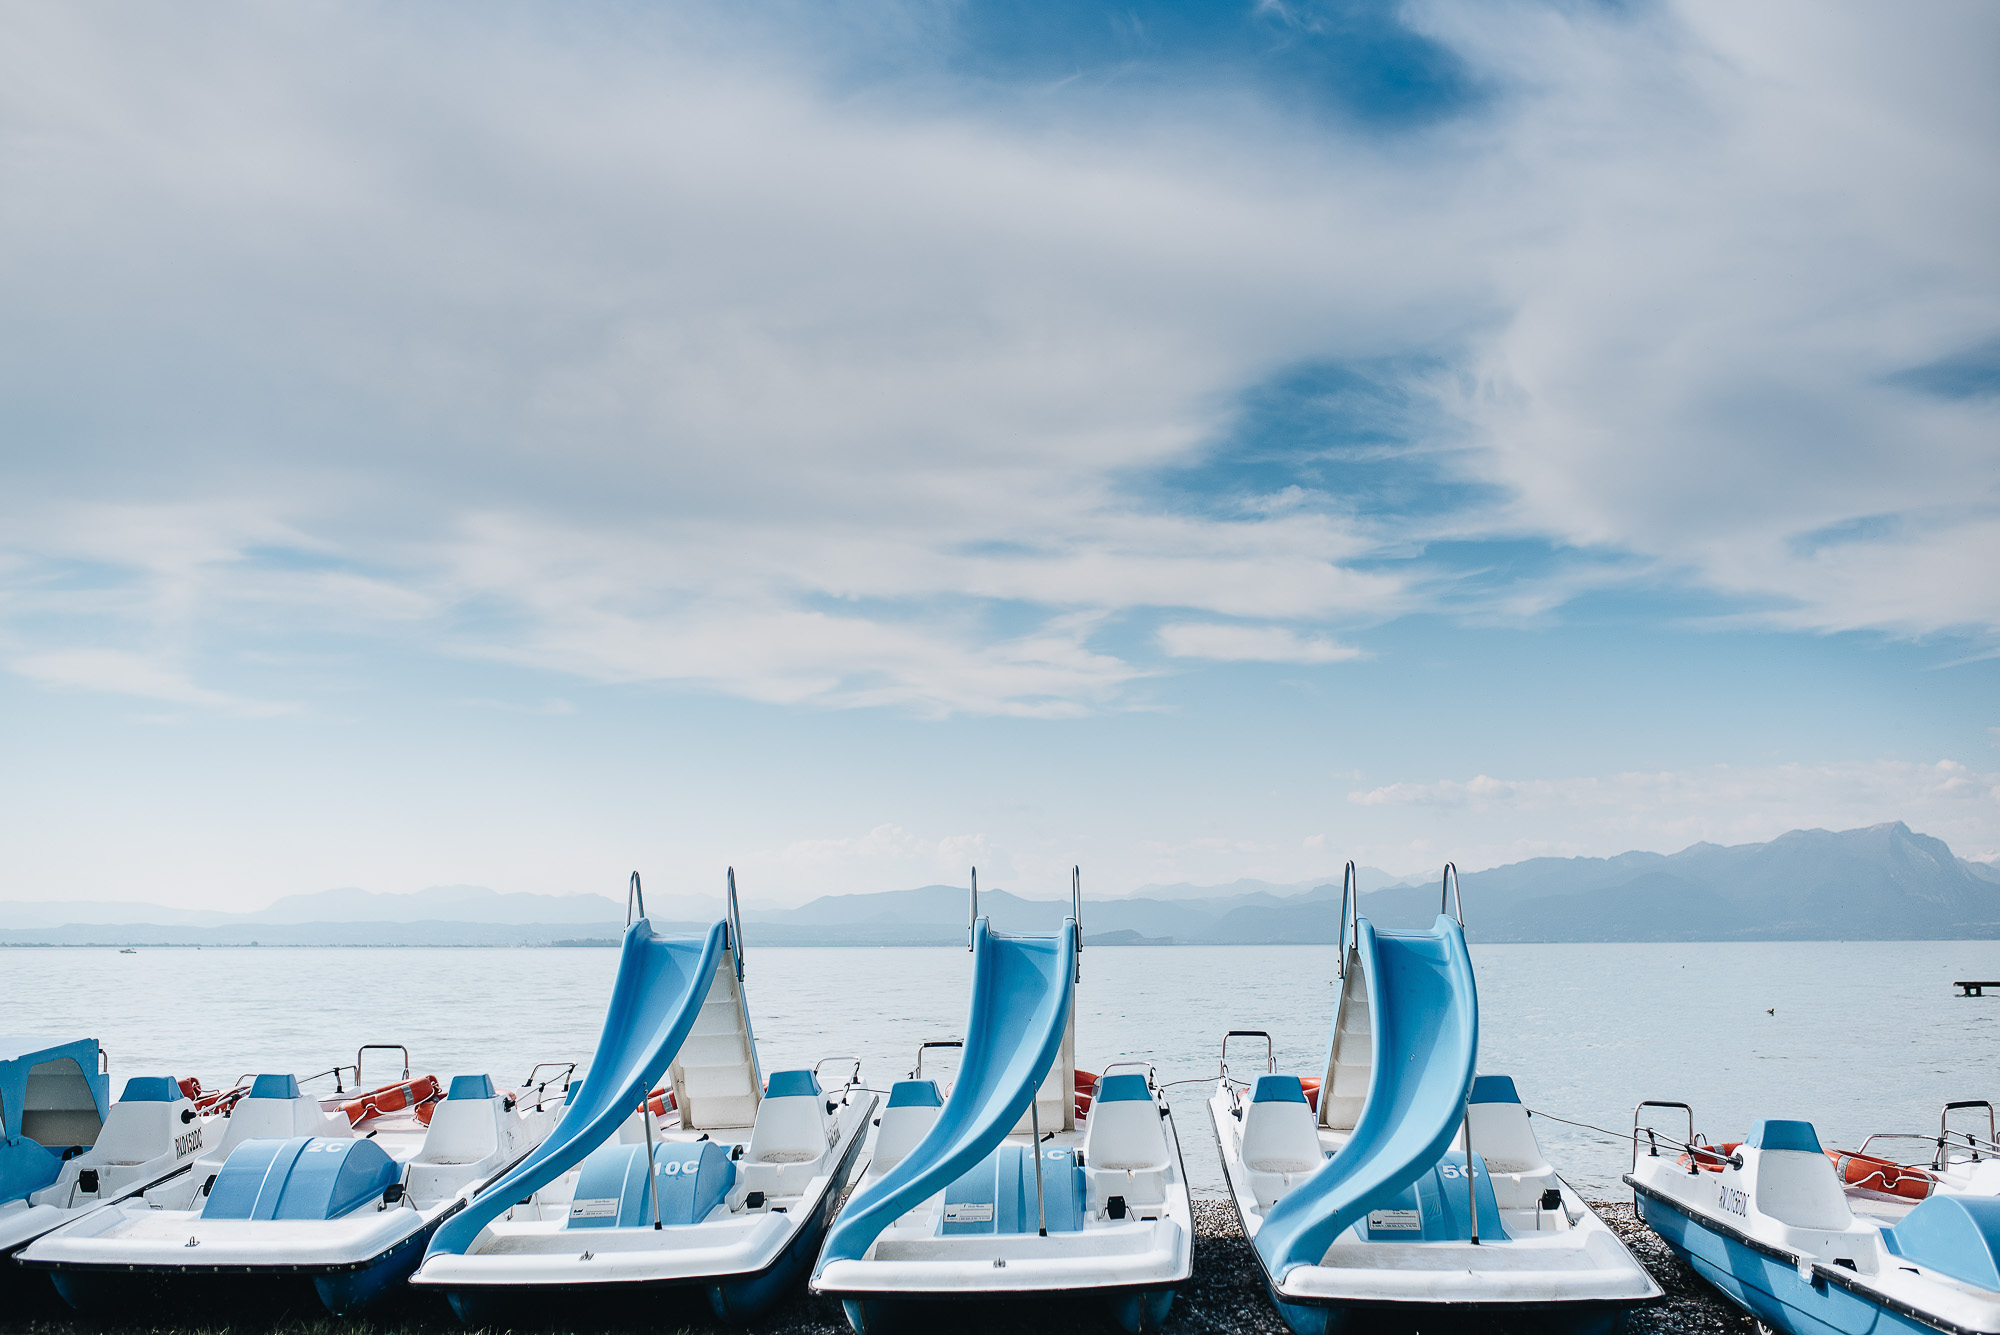 Lake Garda | Italy | Things to do and see Blog | Photography